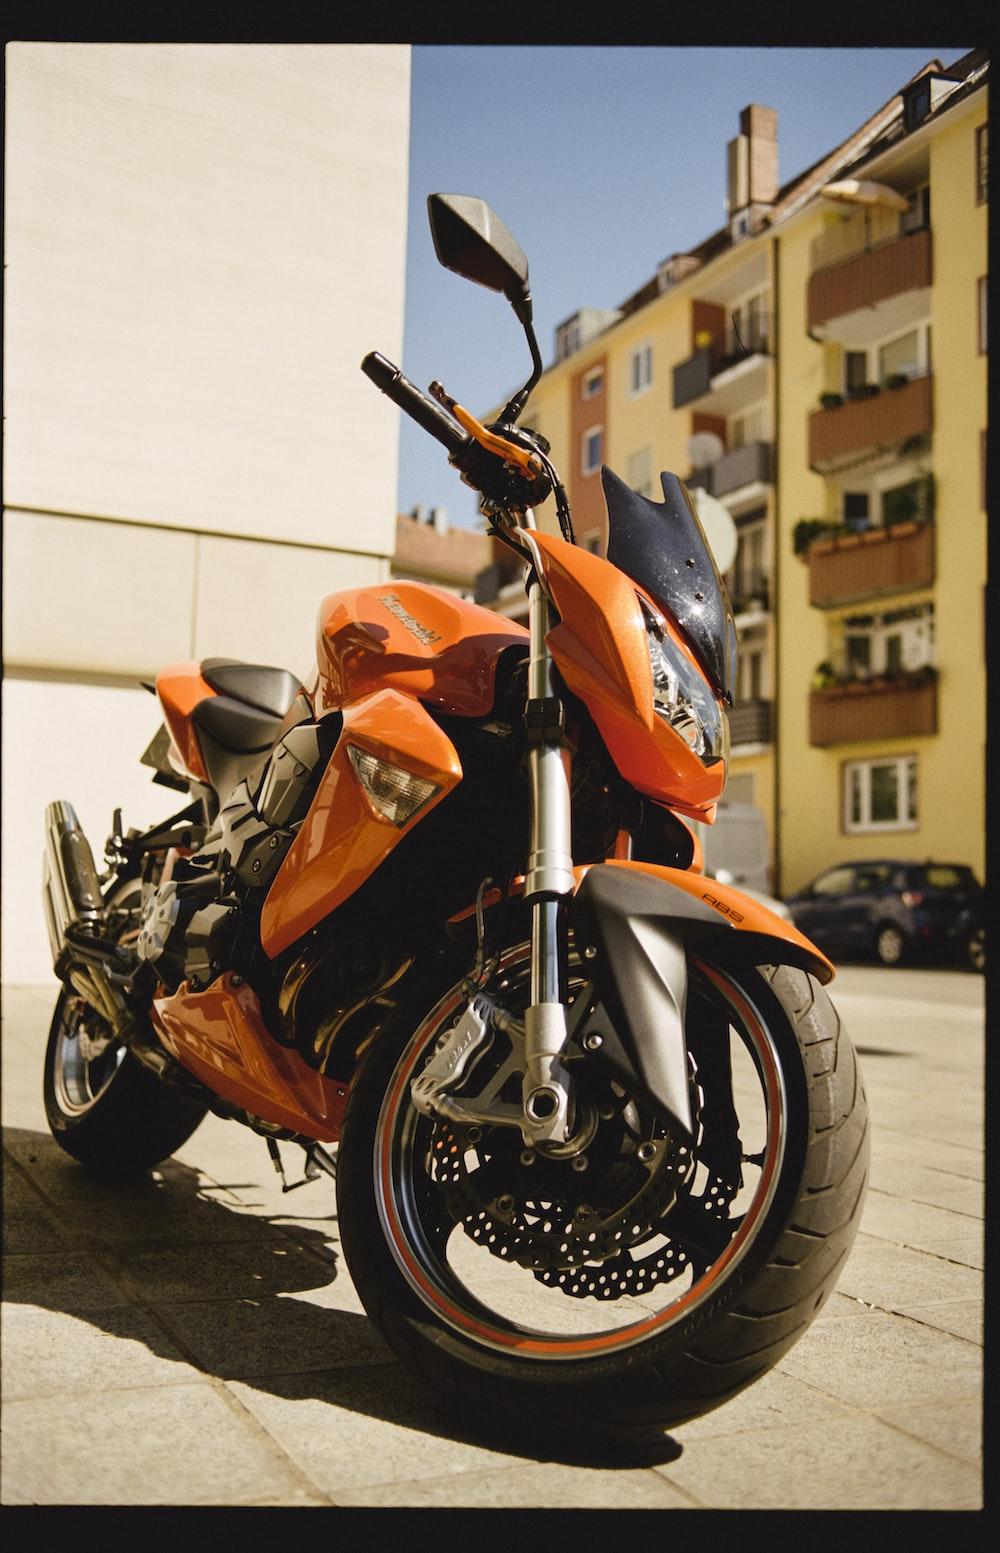 orange and black sports bike parked on sidewalk during daytime